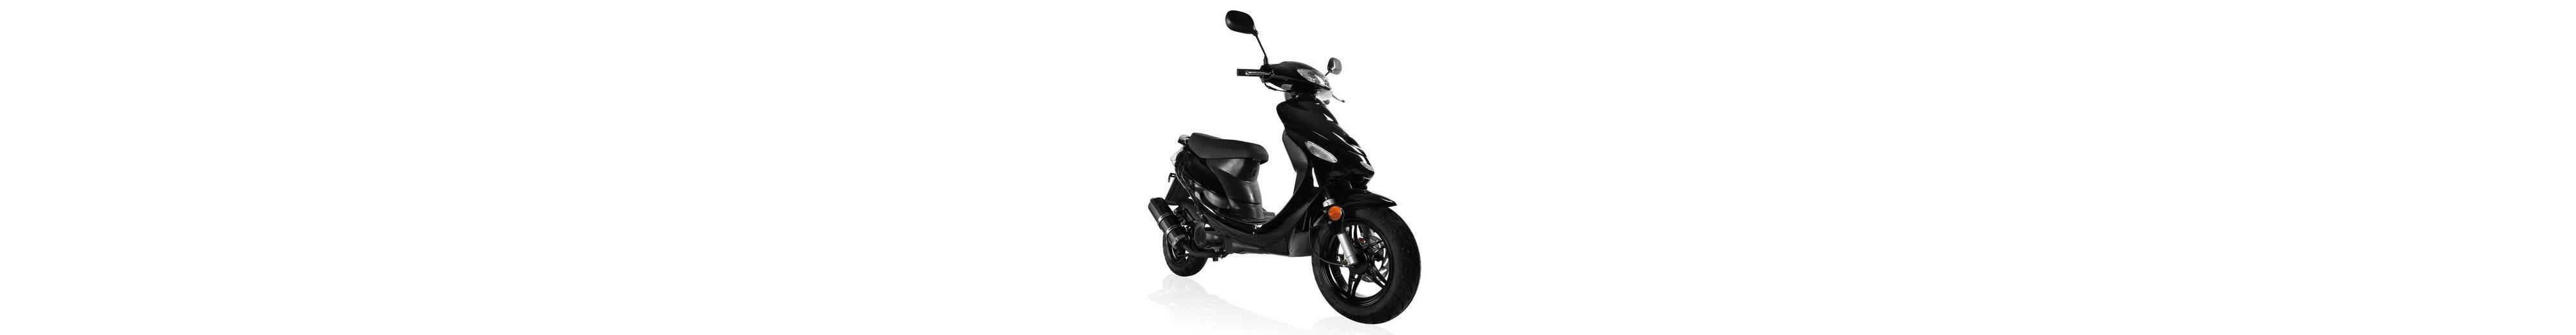 Motorroller, Motoworx, »Forza«, 50 ccm 45 km/h, 4,21 PS, schwarz